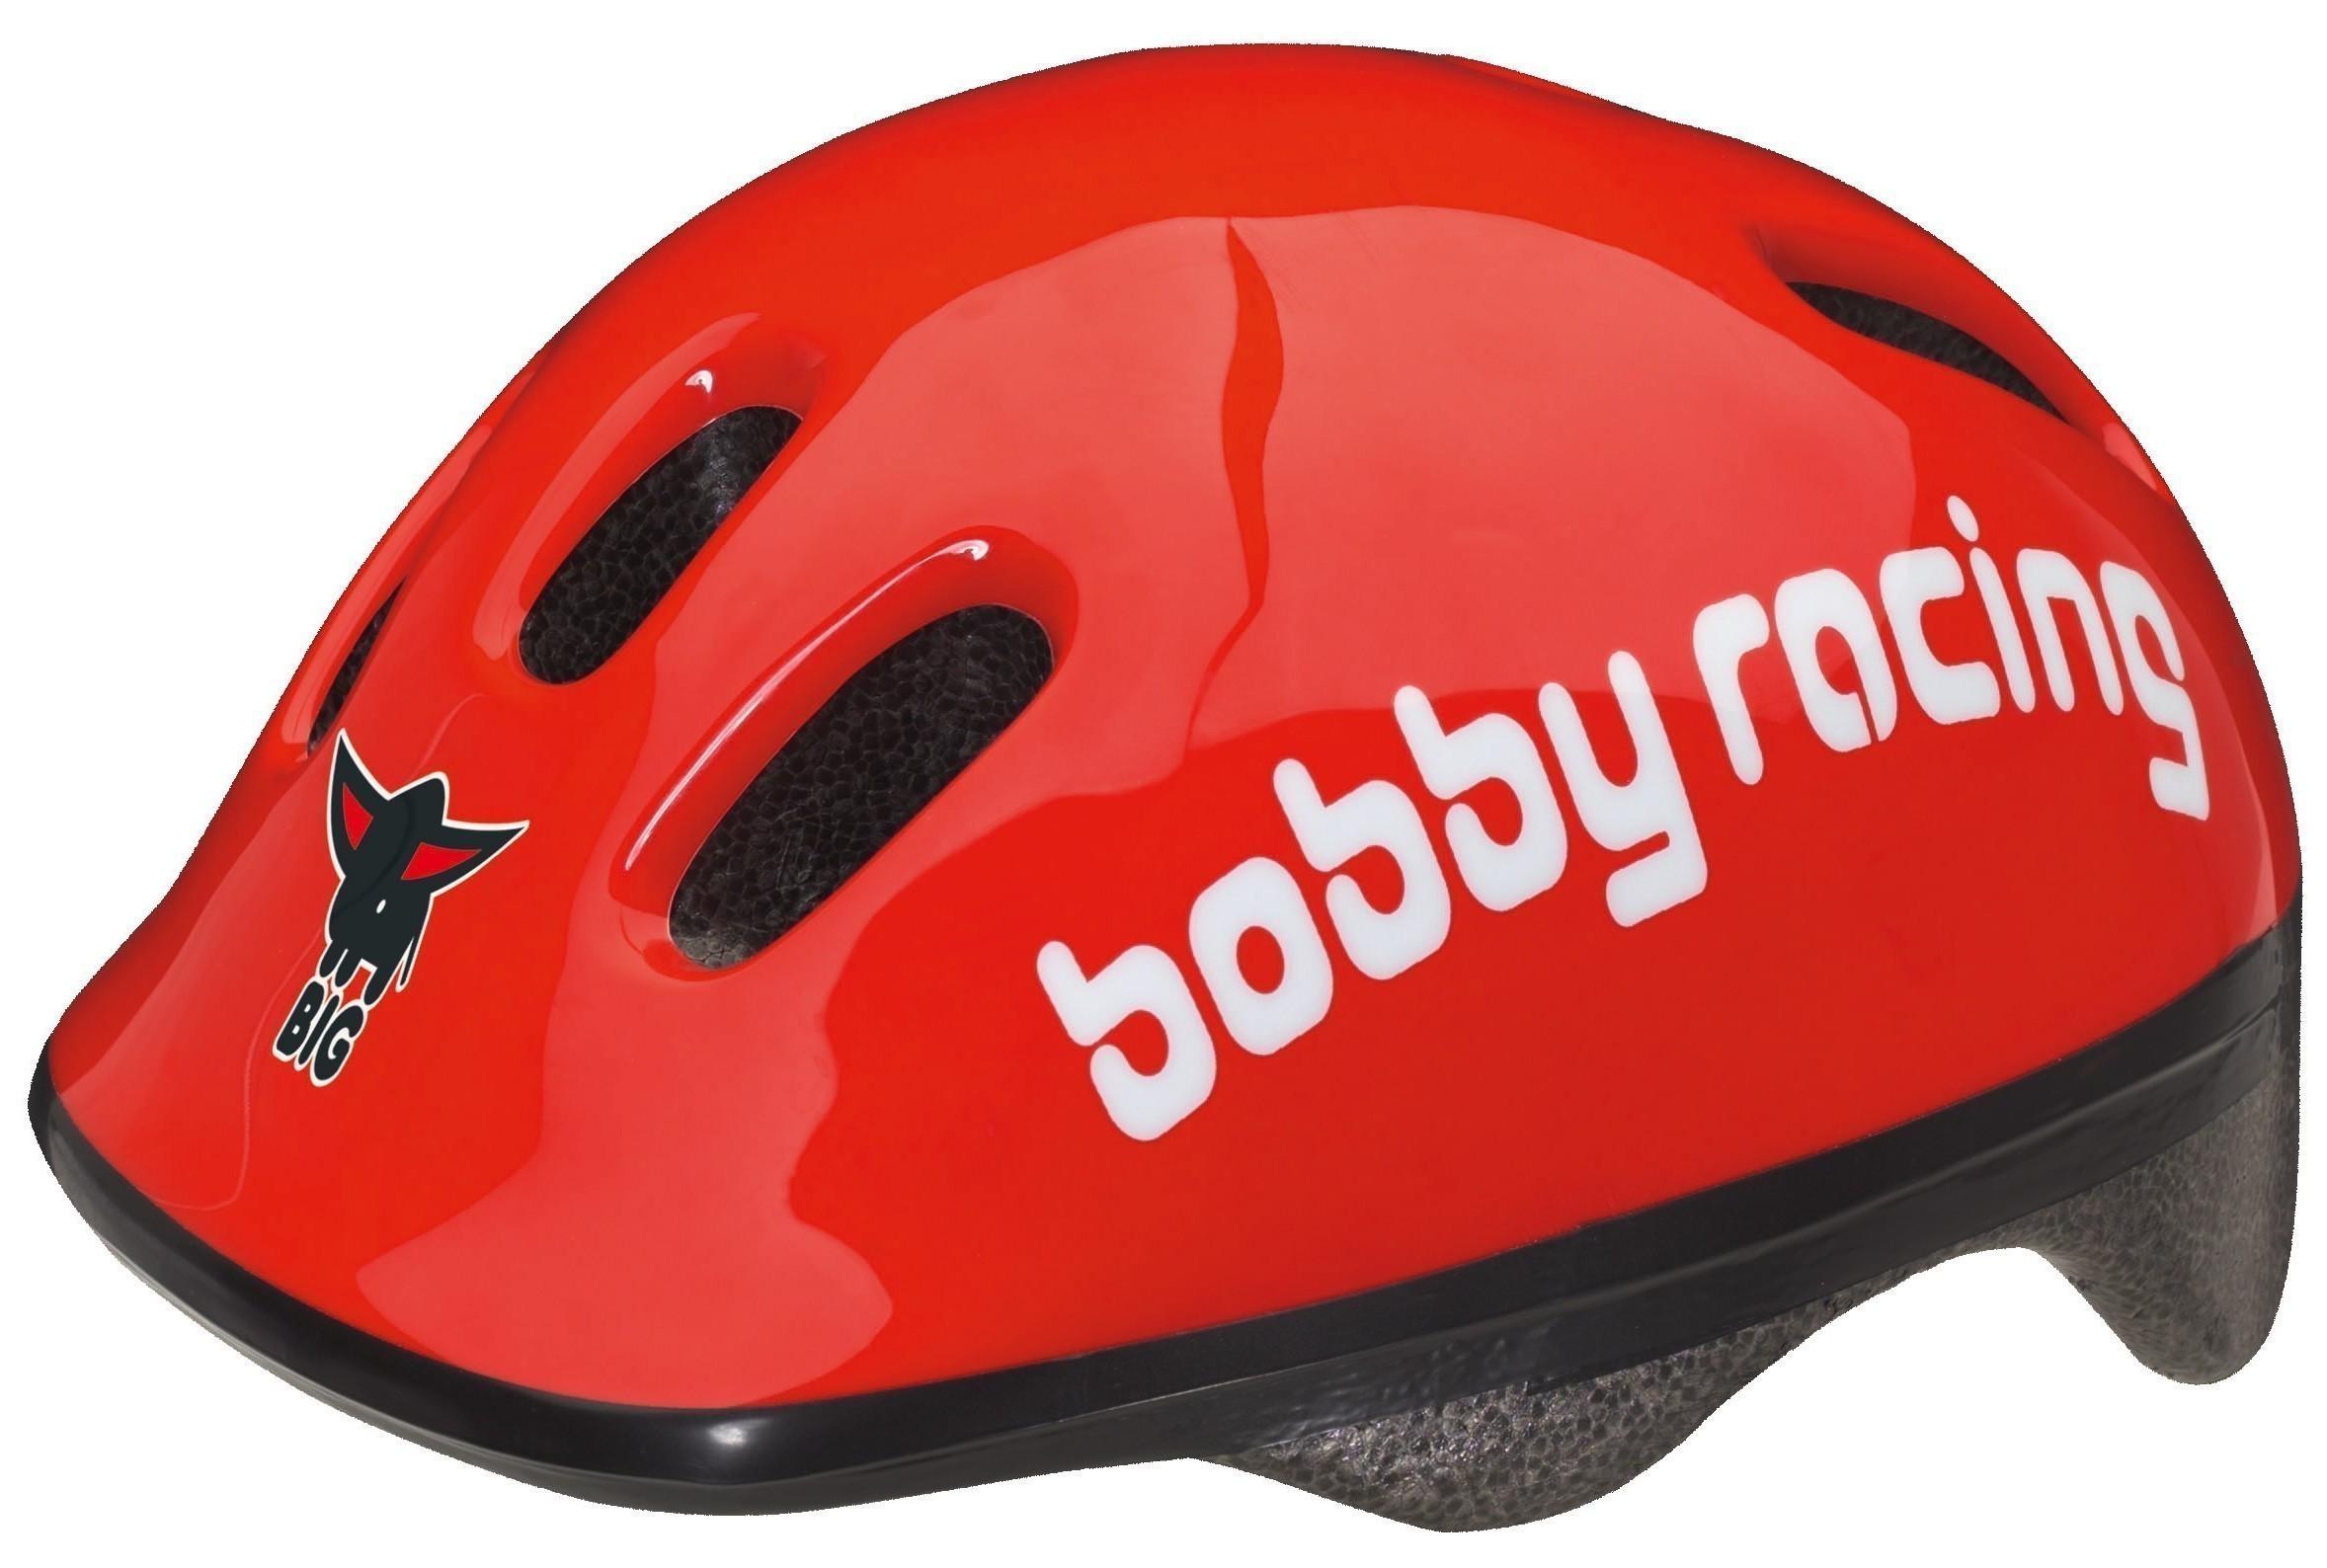 BIG Bobby Racing Helmet / Fahrradhelm Bild 1